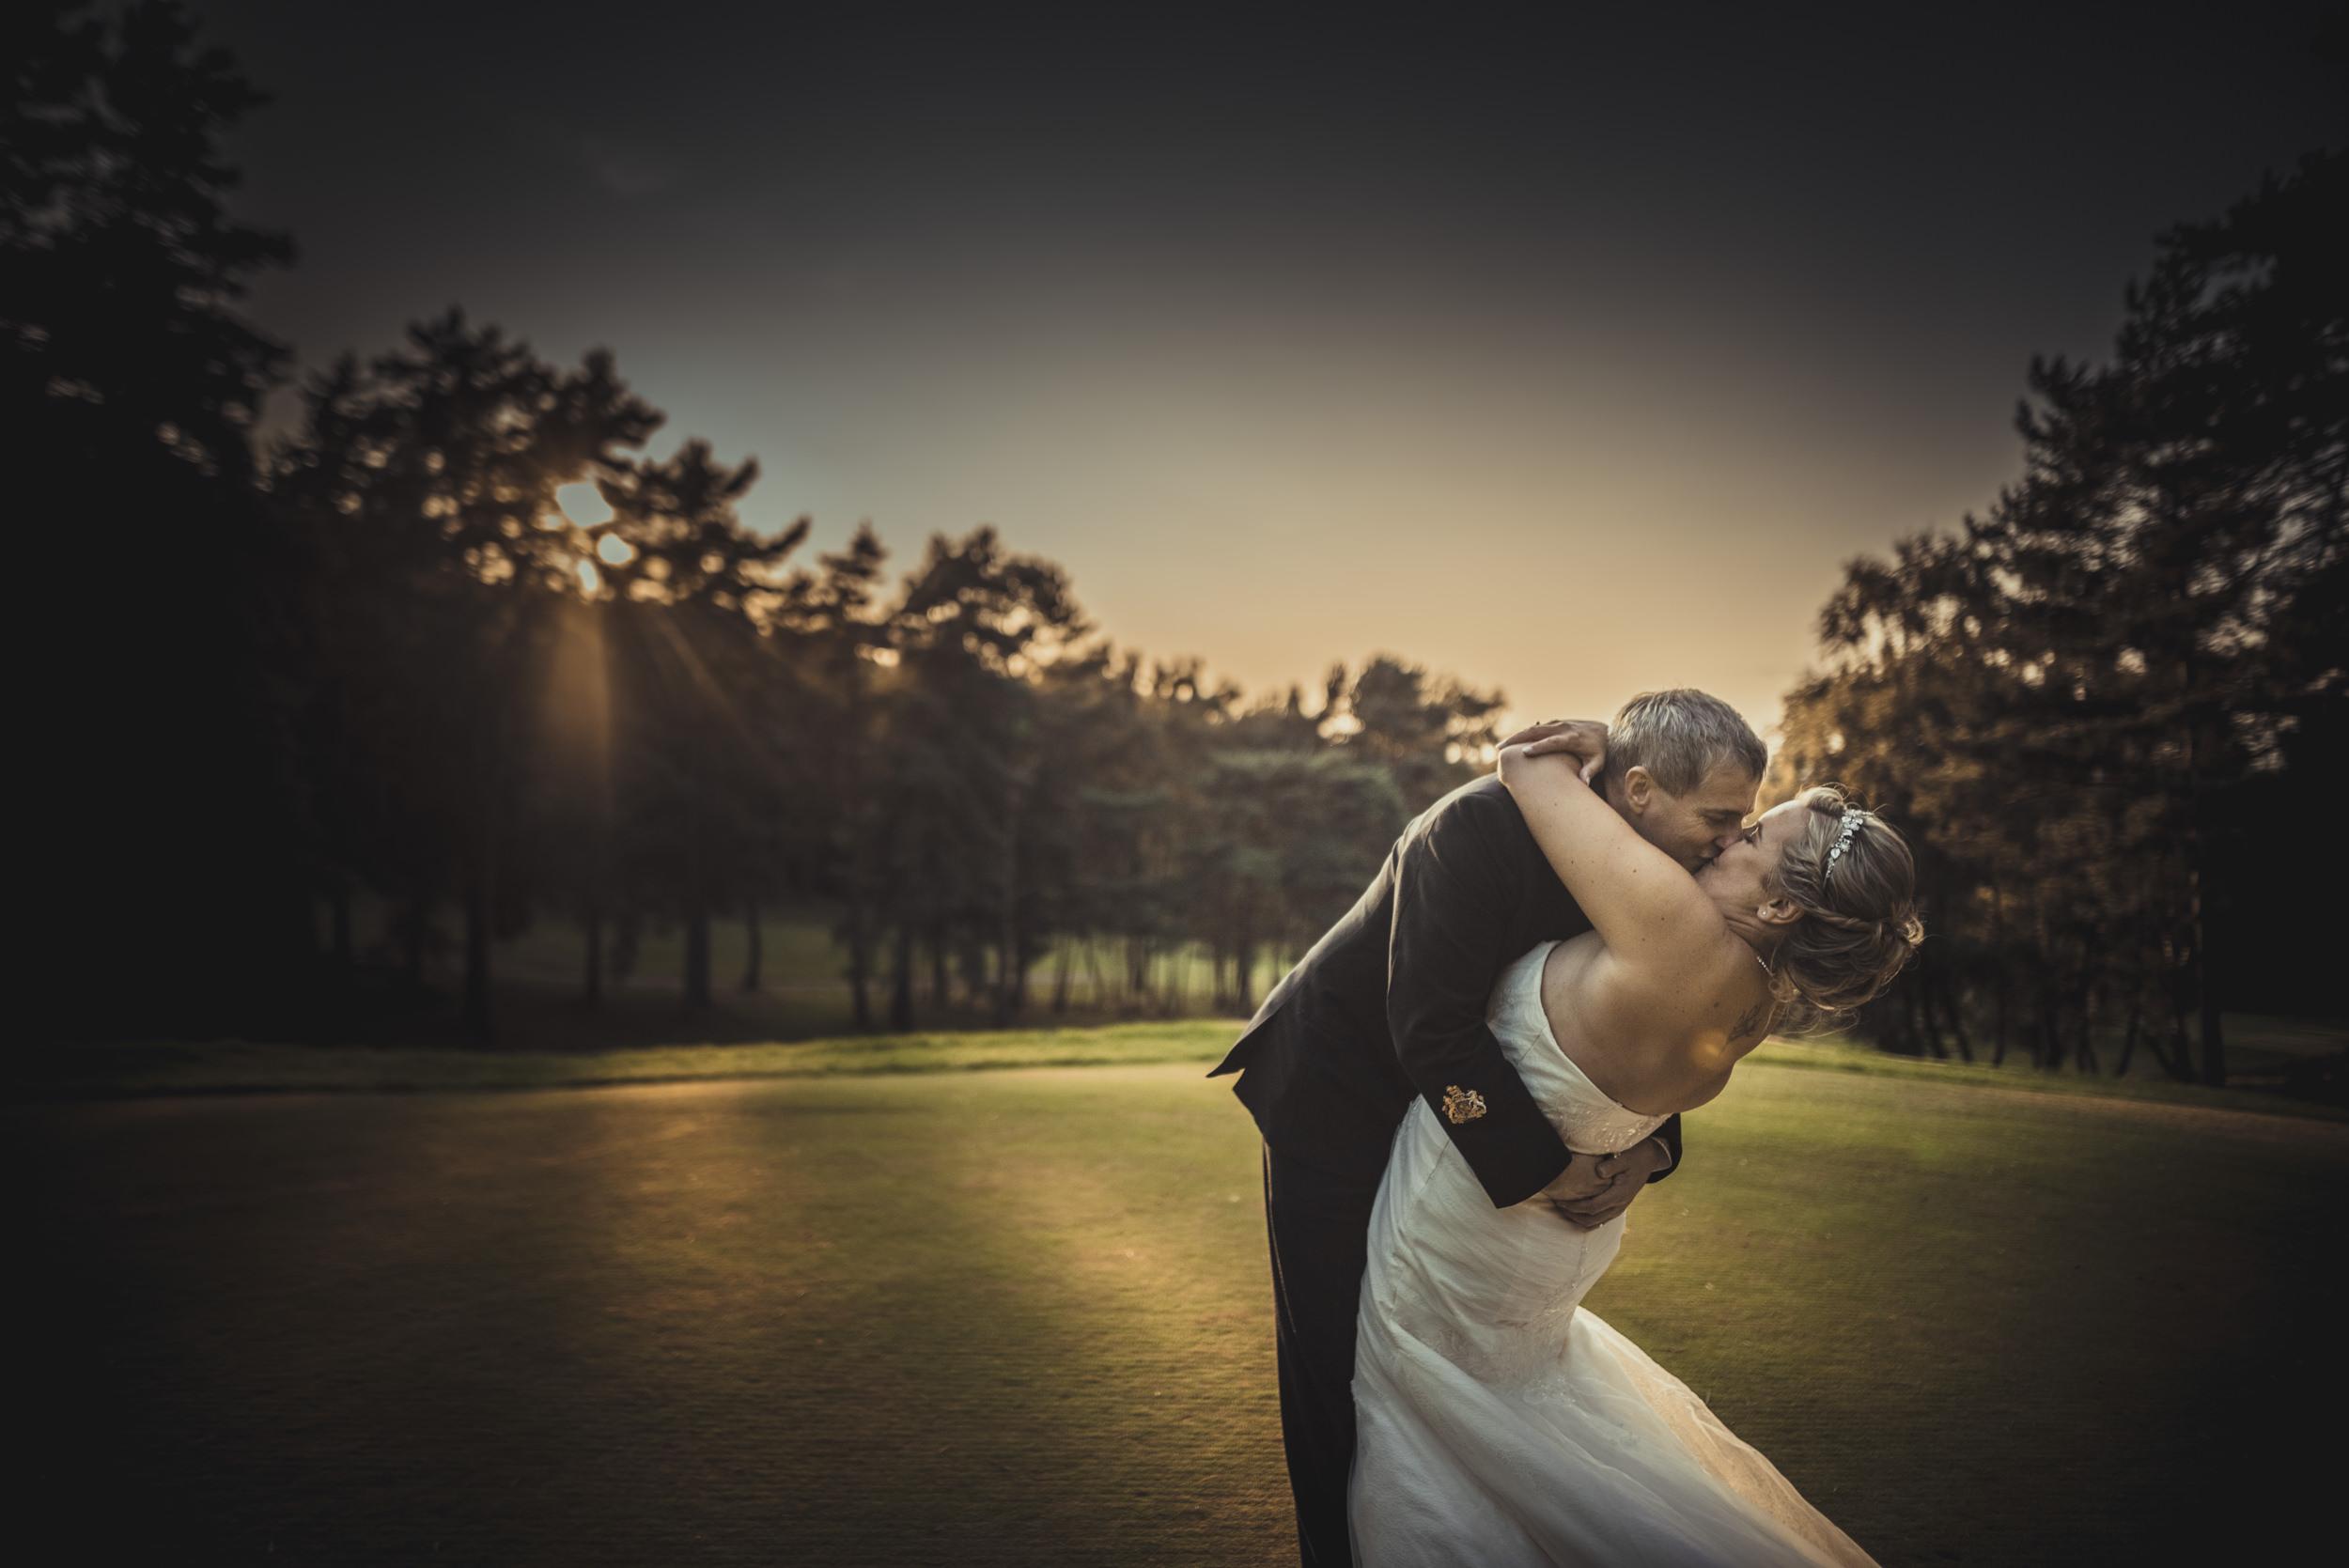 Chantelle-and-Stephen-Old-Thorns-Hotel-Wedding-Liphook-Manu-Mendoza-Wedding-Photography-472.jpg